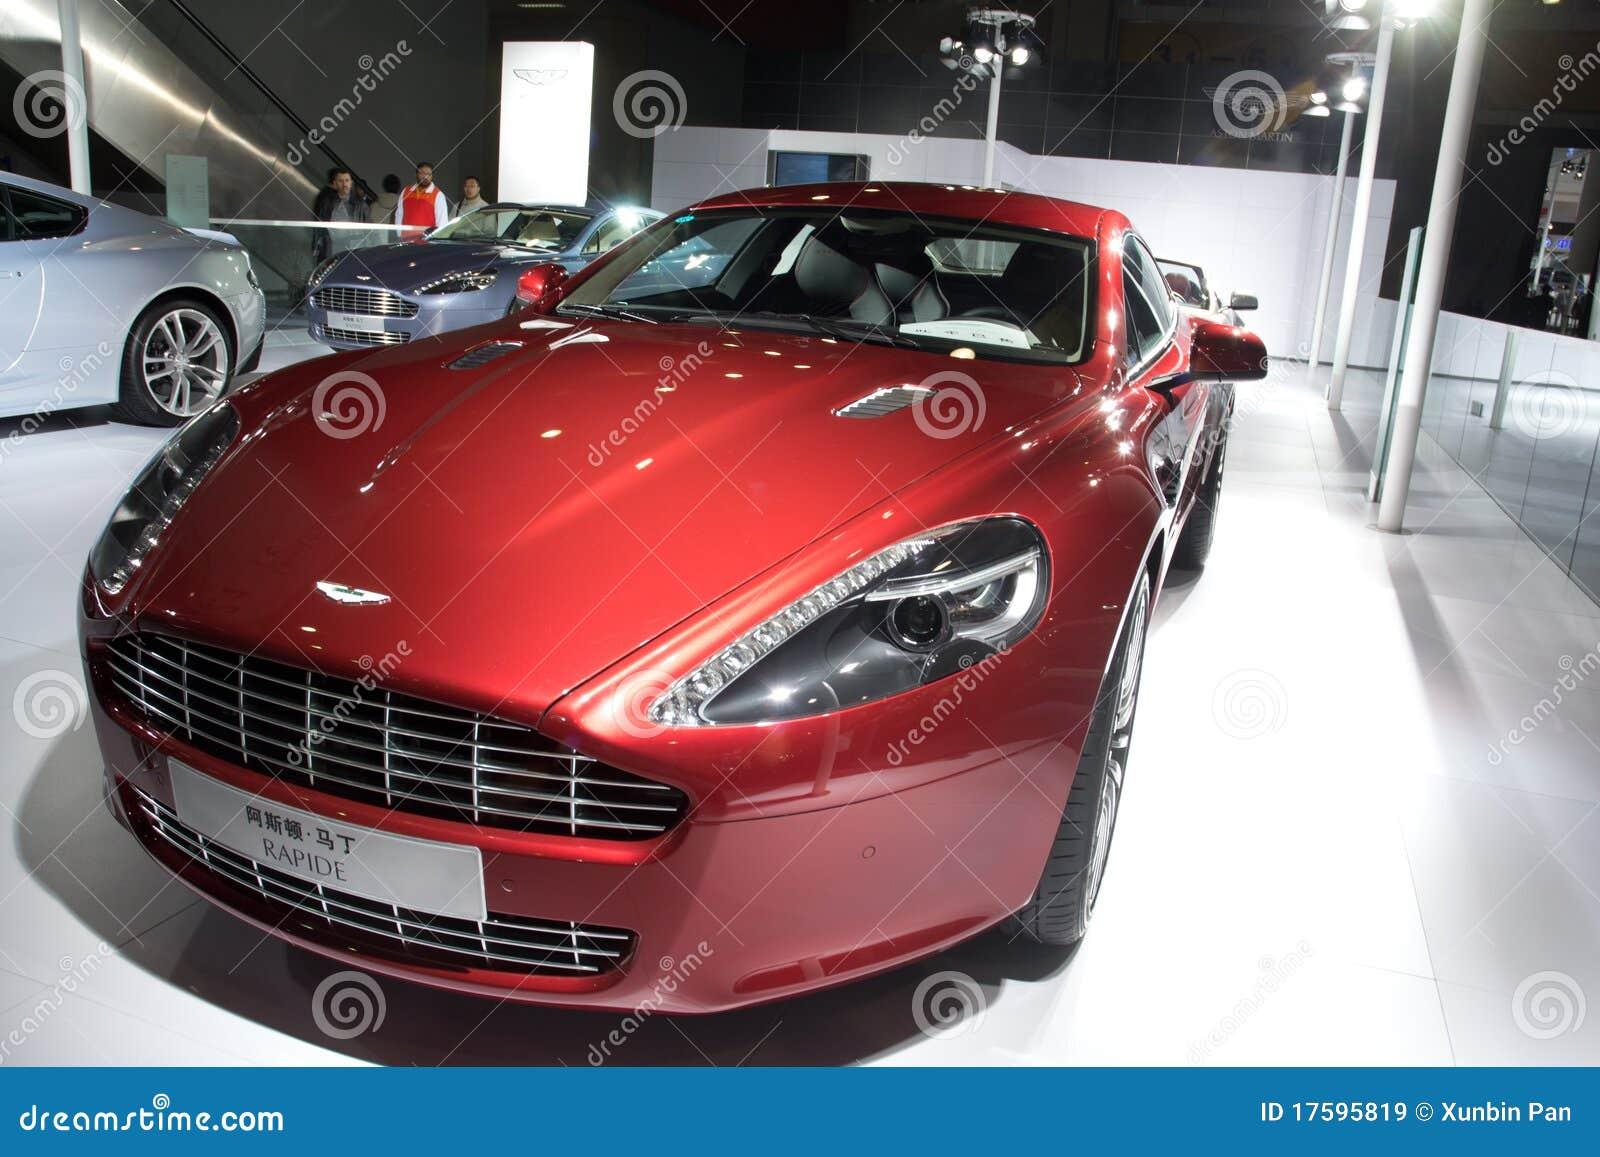 Aston Martin Rapide Sport Car Editorial Stock Image Image Of